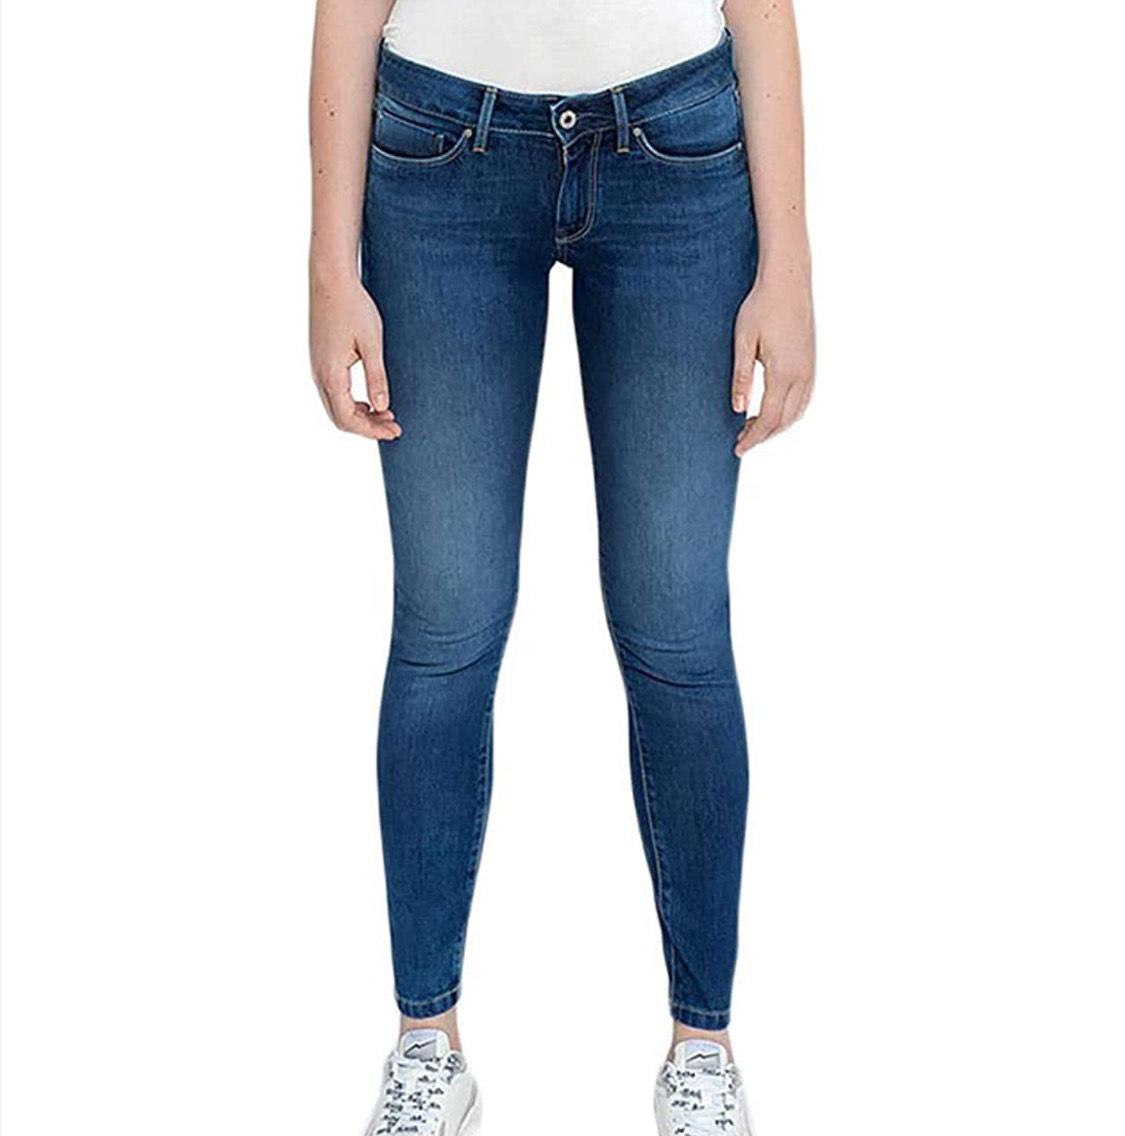 Vaqueros Pepe Jeans mujer talla 29 (40)